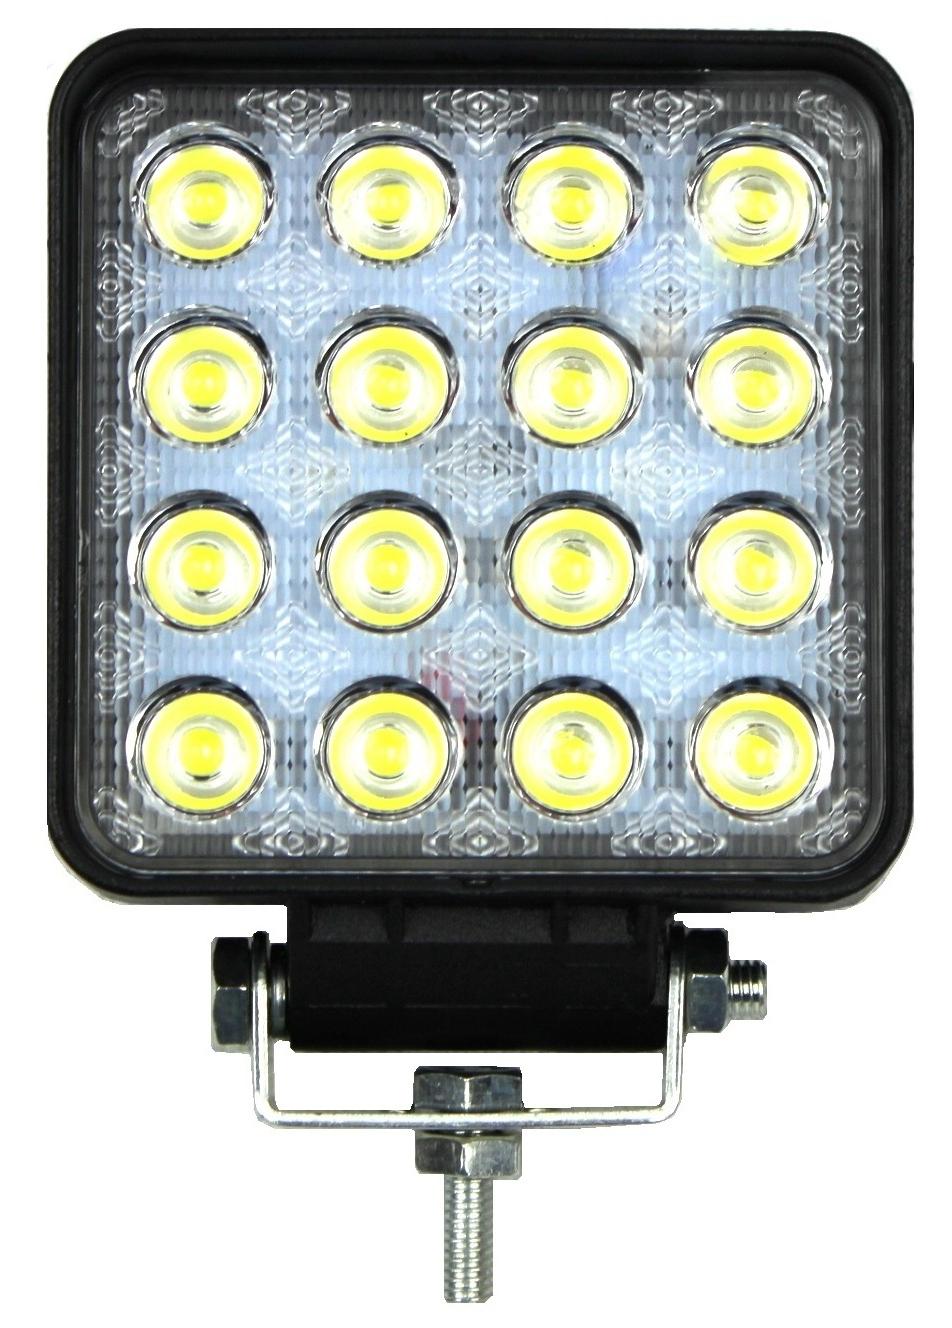 LAMPA ROBOCZA 16 LED HALOGEN 48W 12V 24V LEDOWA